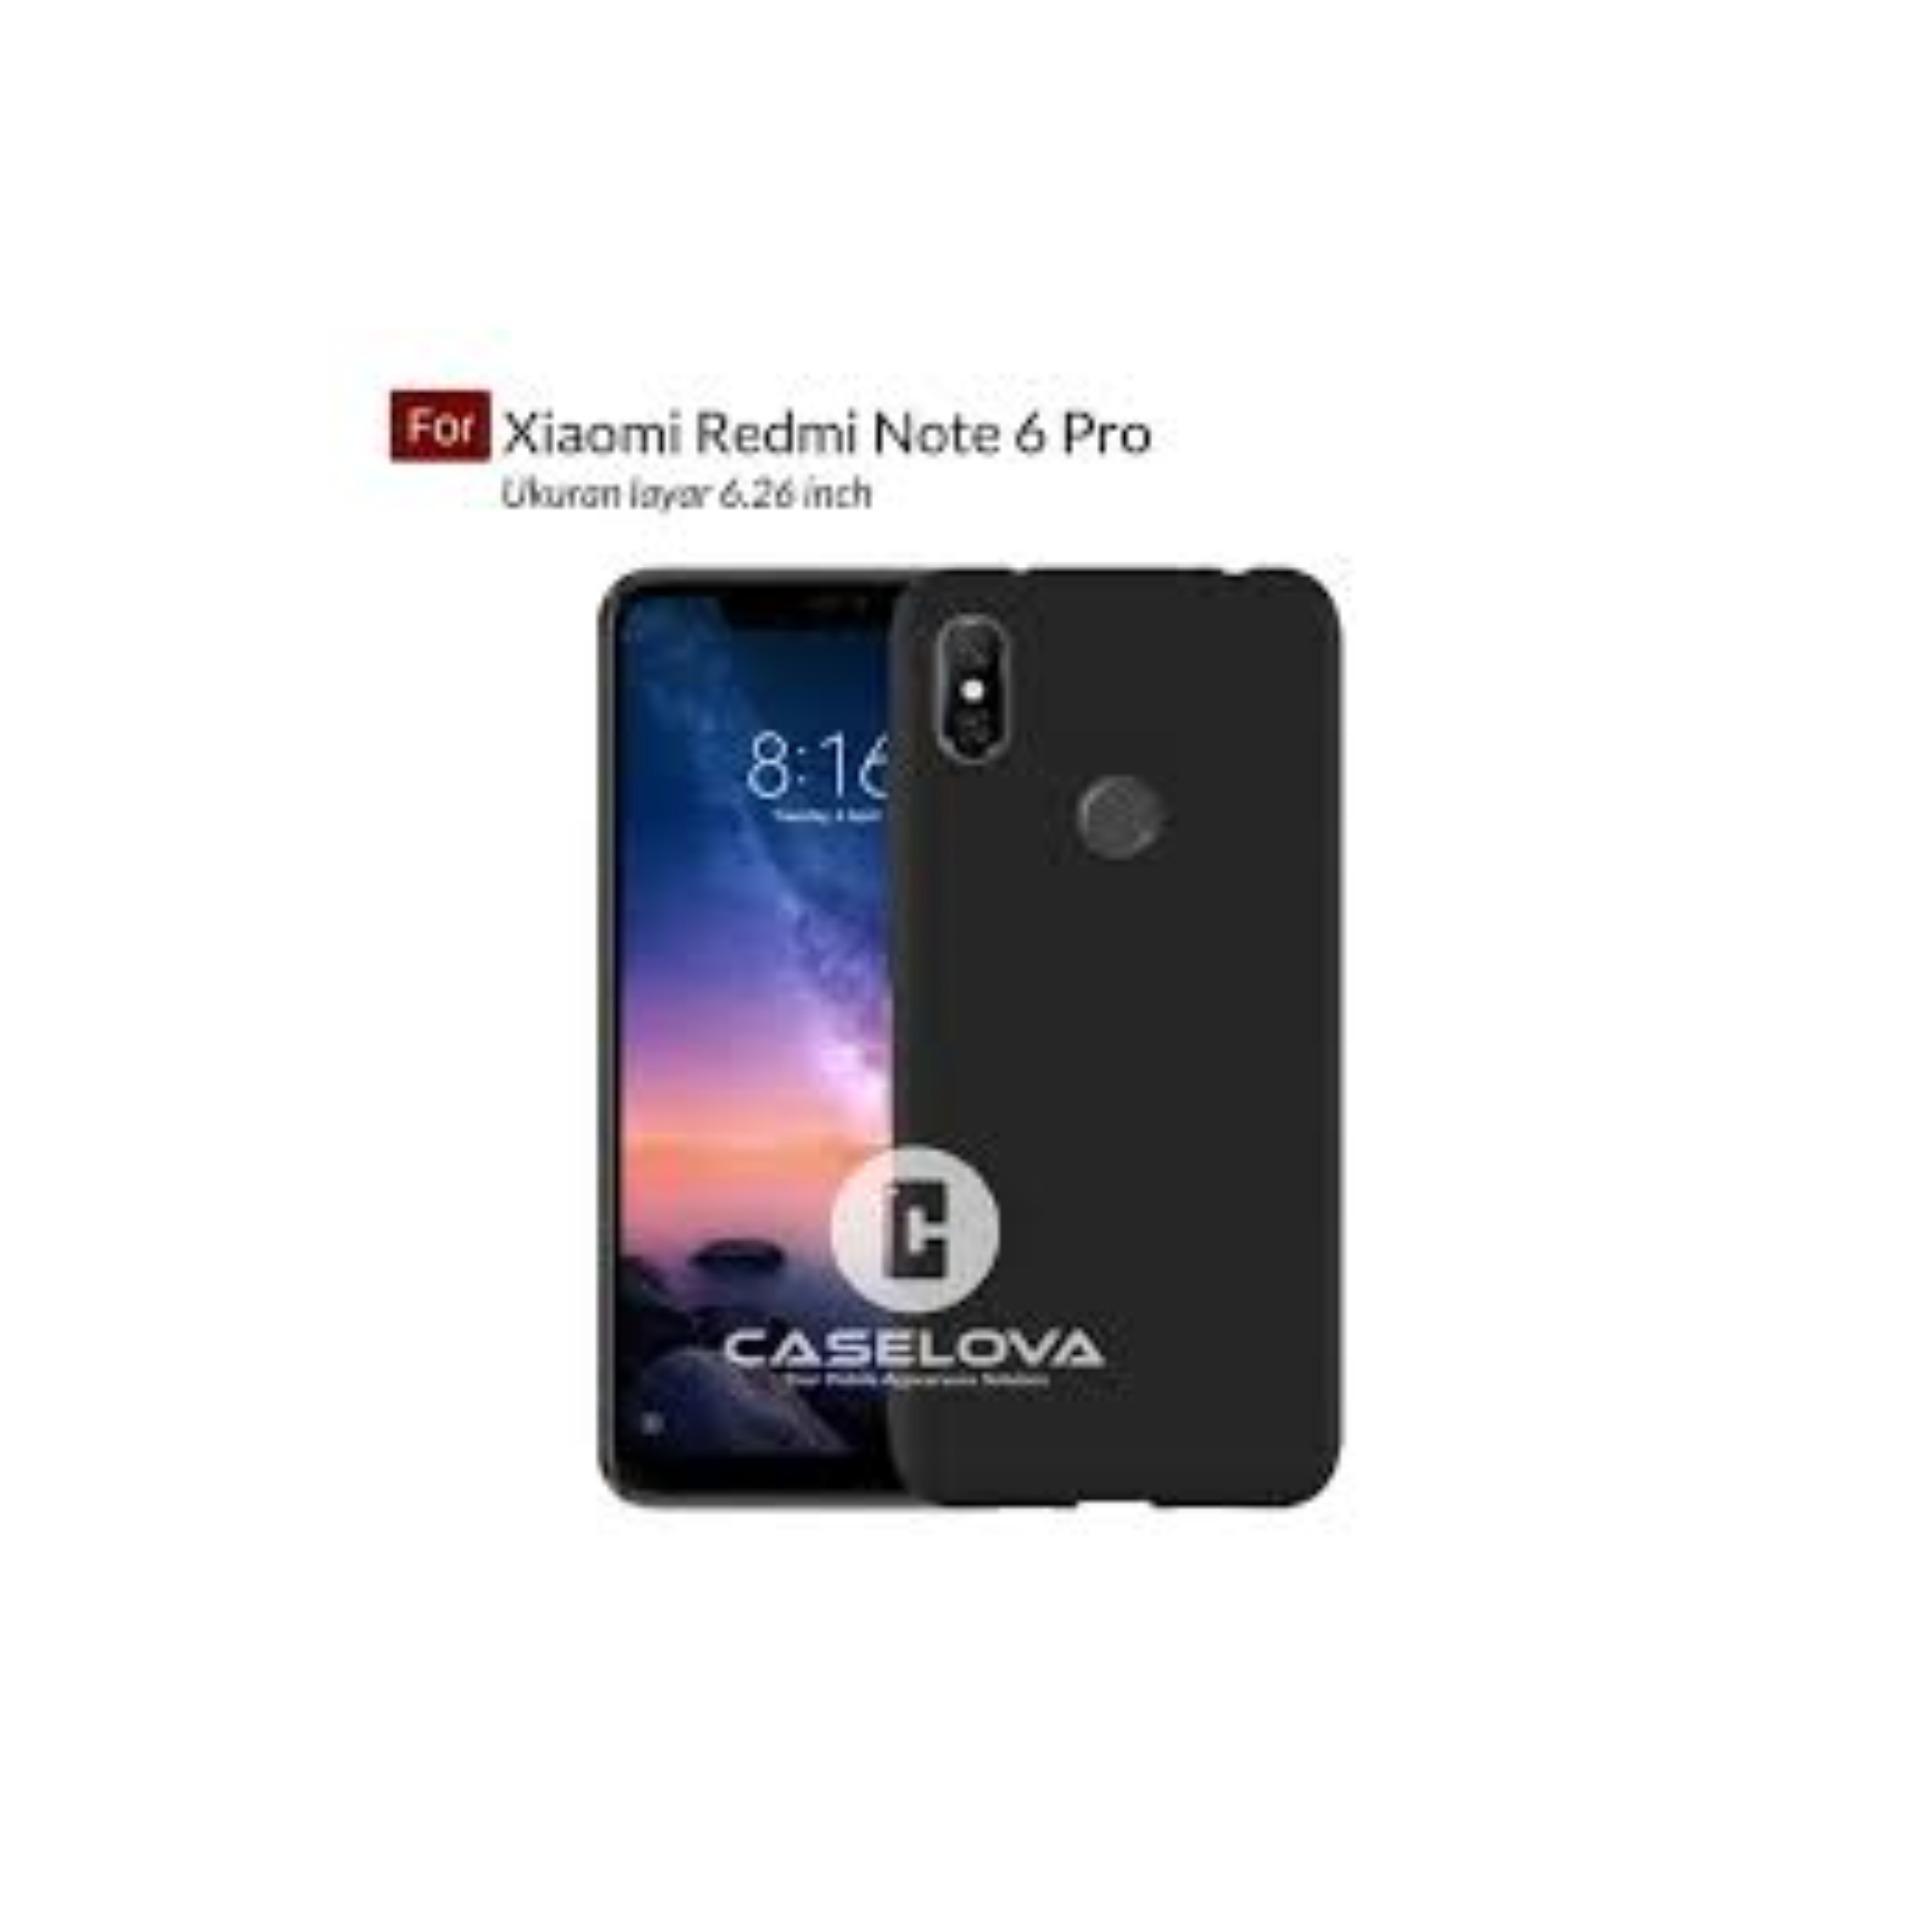 ULYBAE UltraSlim Black Matte Hybrid Case for Xiaomi Redmi Note 6 - Black -  JUAL CASE MATTE Termurah - Terlaris Jakarta